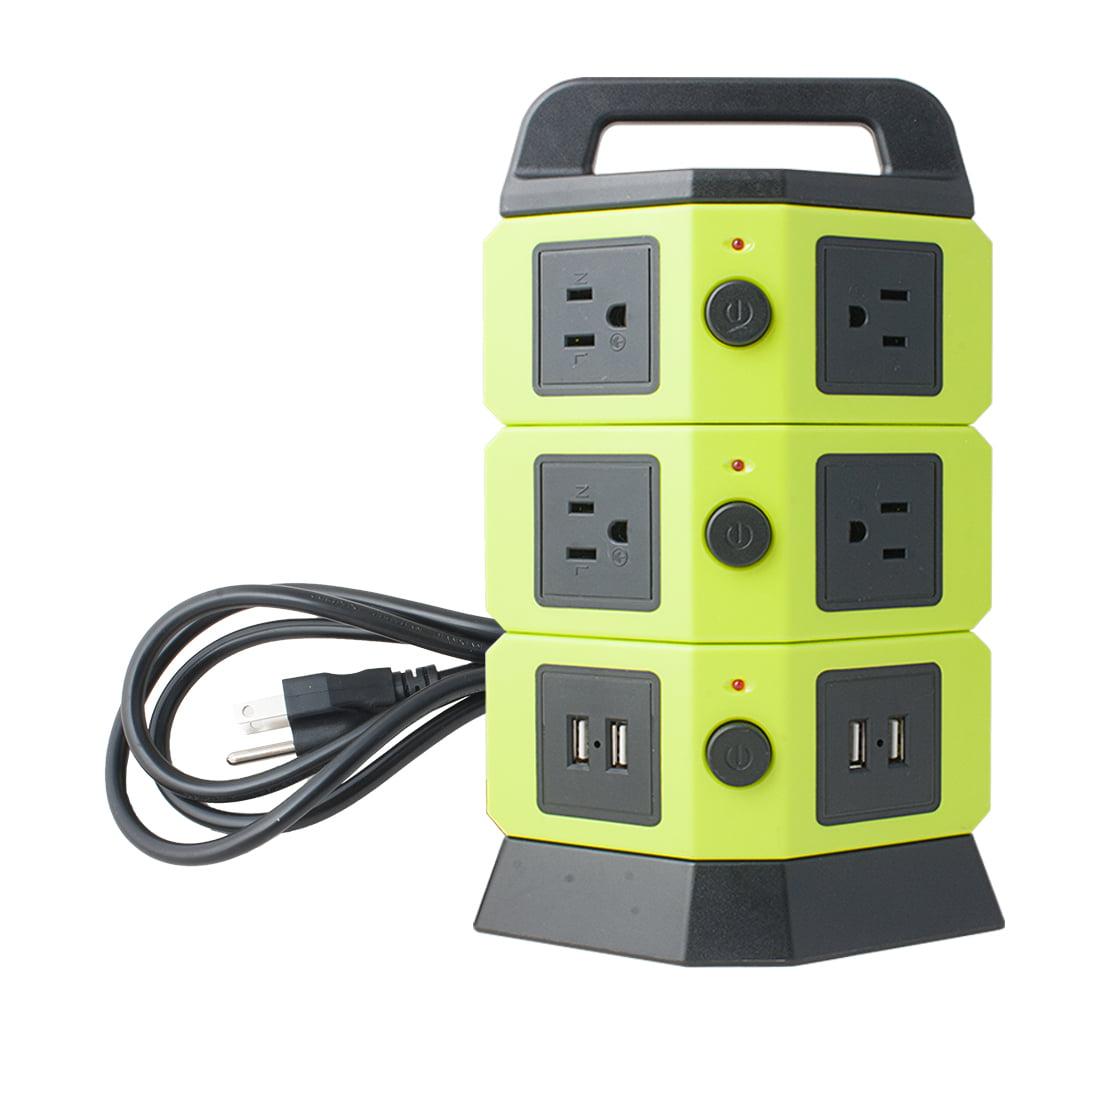 110V-250V 7 US Socket 4 USB 2100mA Power Outlet Vertical Multi-Socket Green